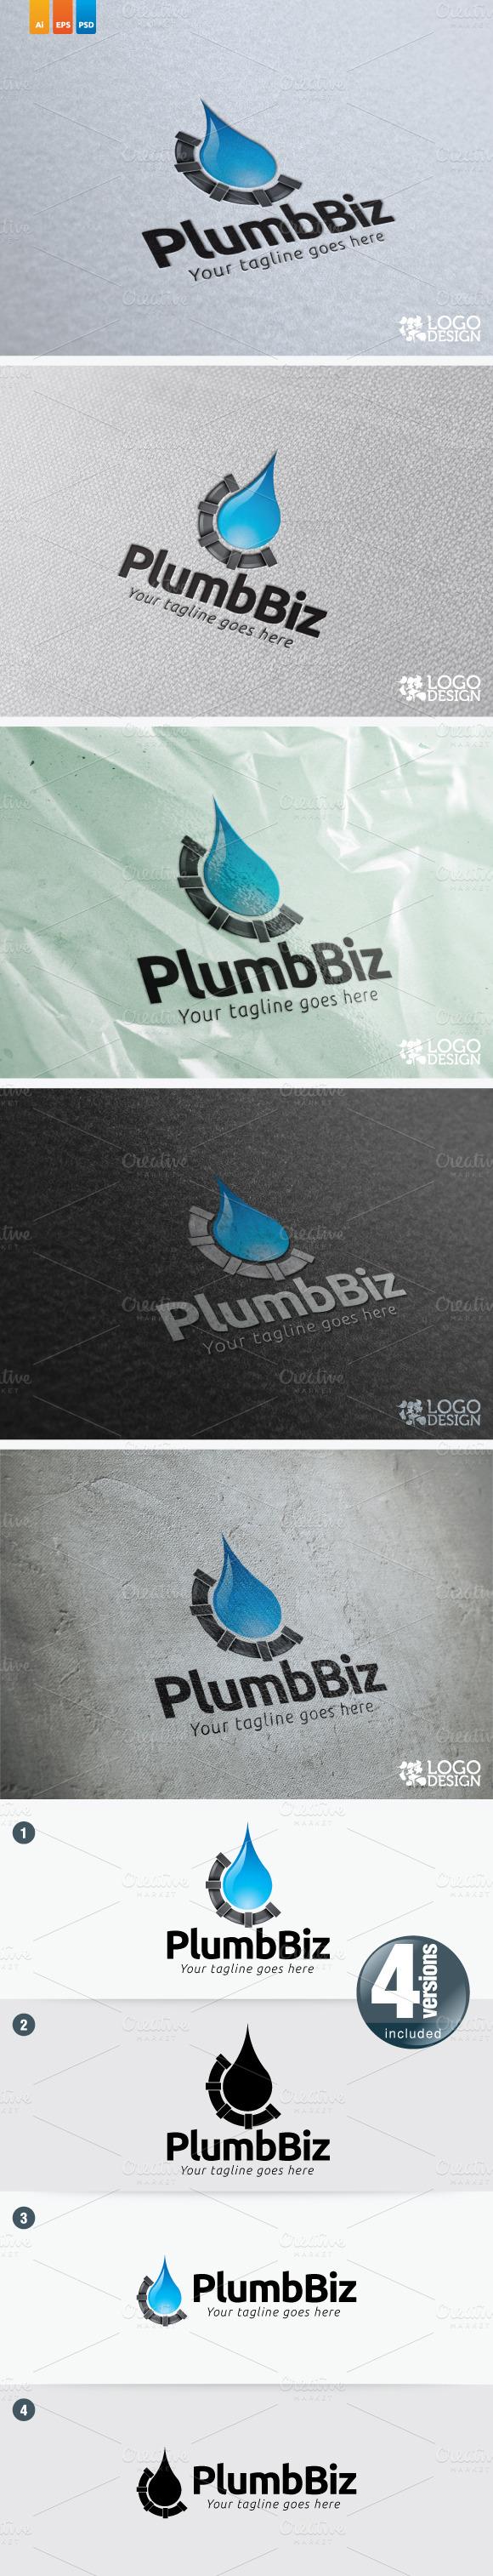 PlumBiz